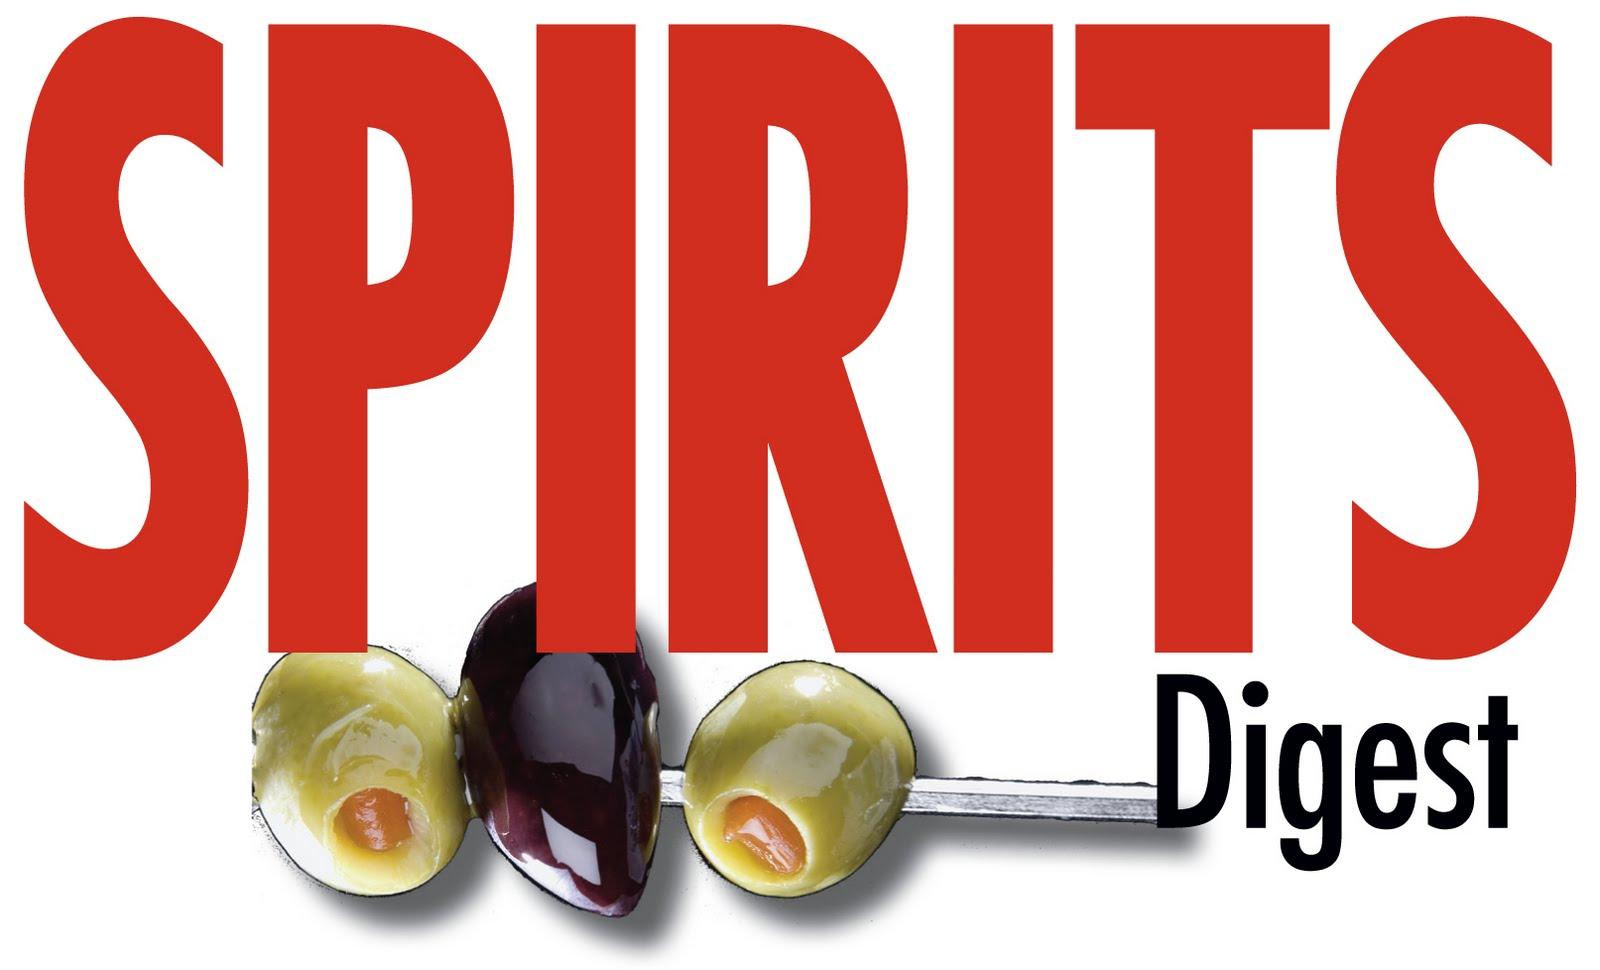 Liquor Digest